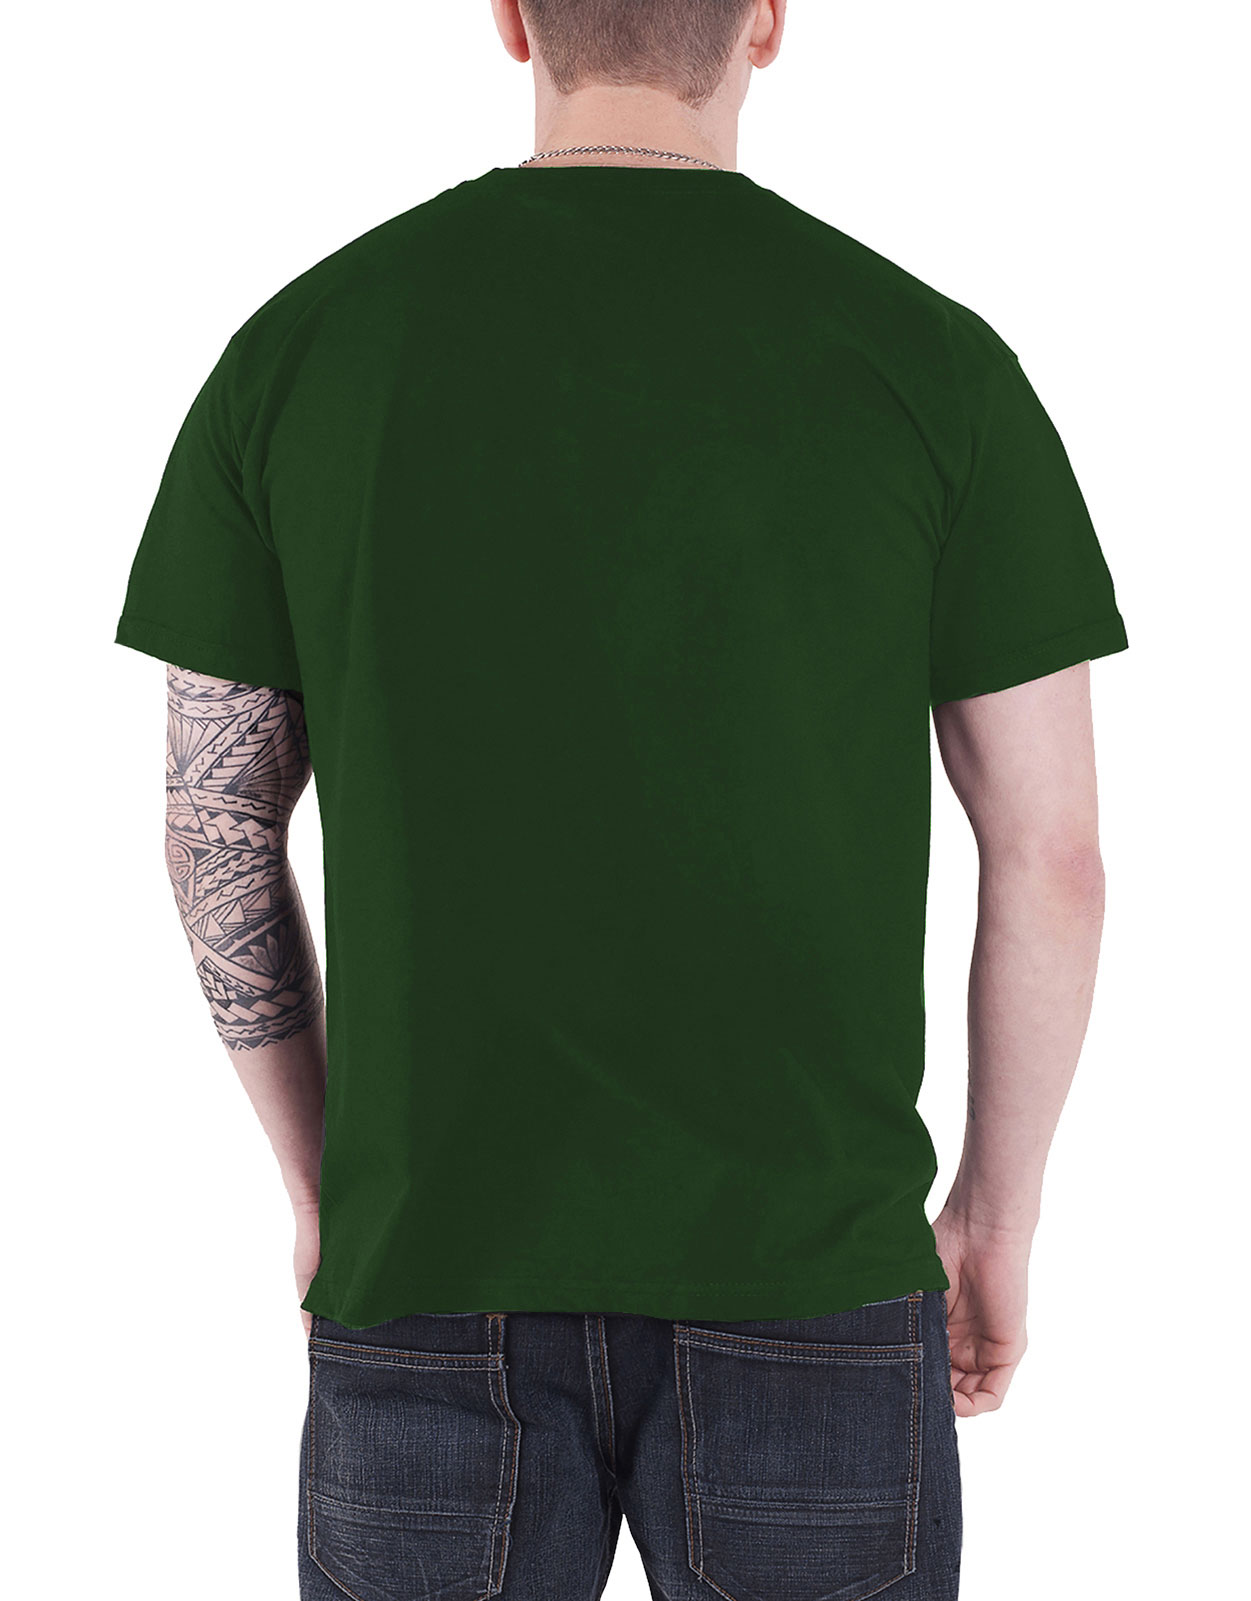 Officiel-Jimi-Hendrix-T-Shirt-Purple-Haze-Are-you-experienced-Logo-Homme-NEUF miniature 27